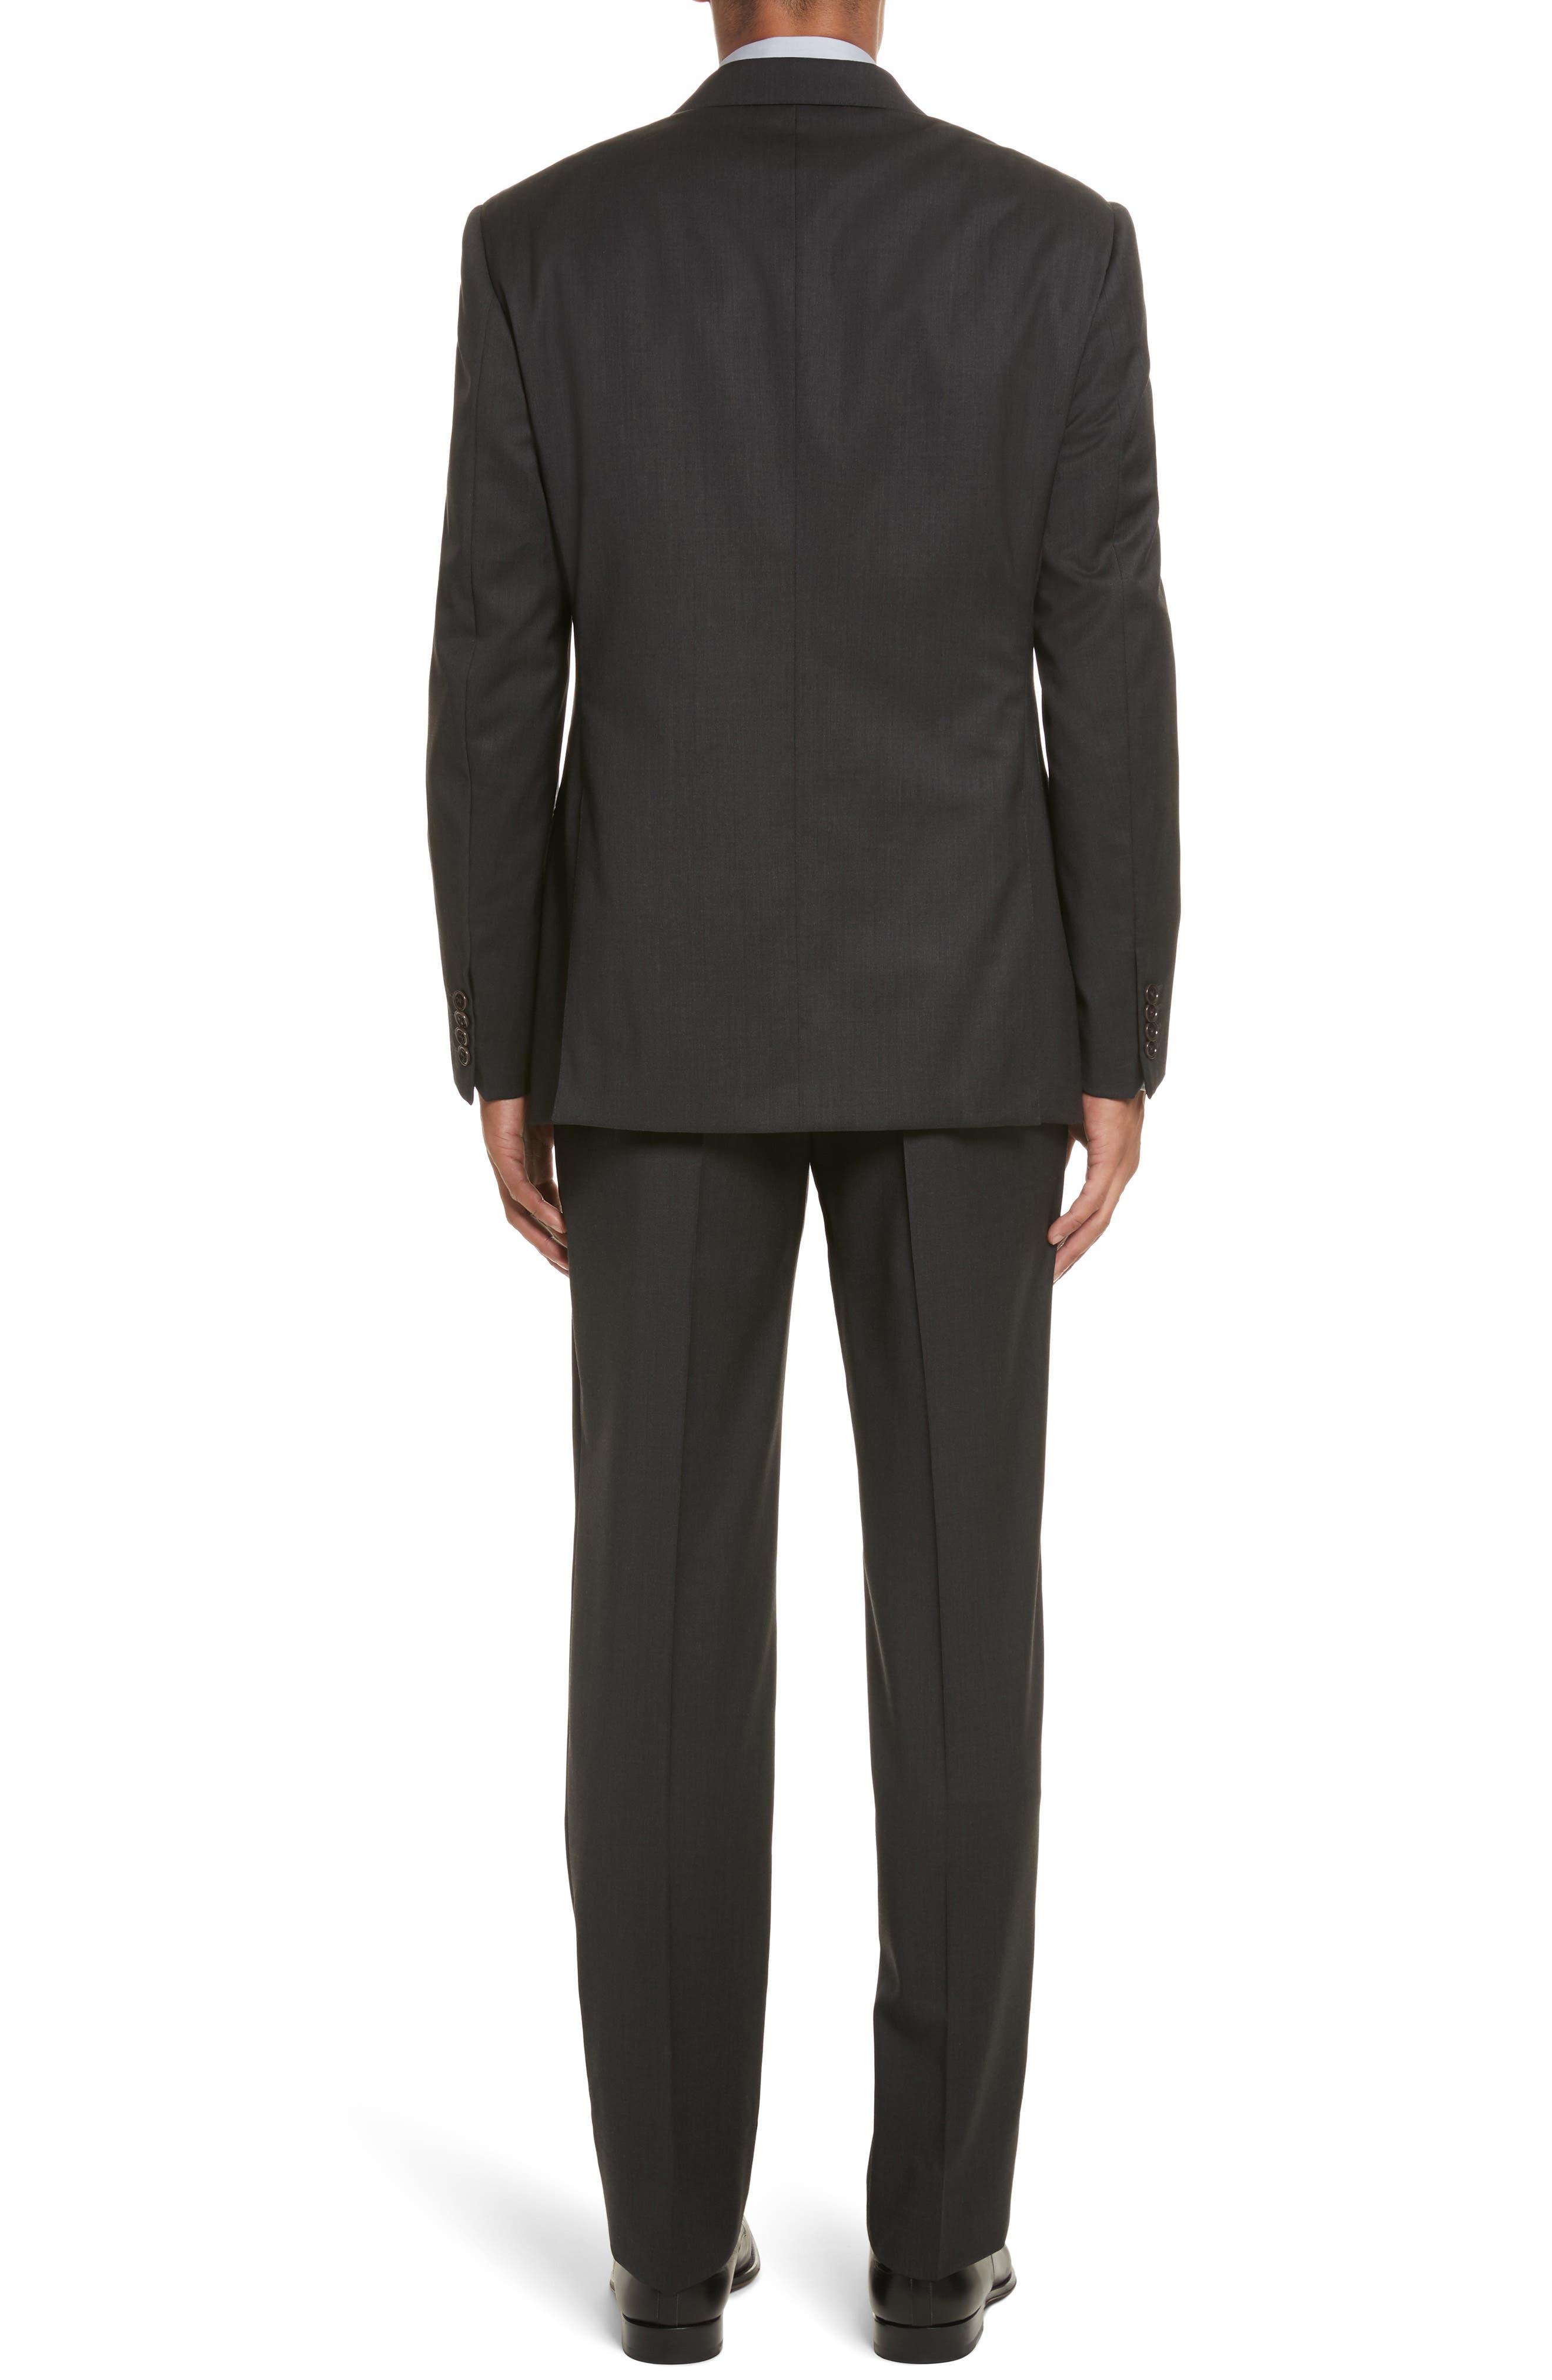 'G-Line' Trim Fit Solid Wool Suit,                             Alternate thumbnail 2, color,                             Charcoal